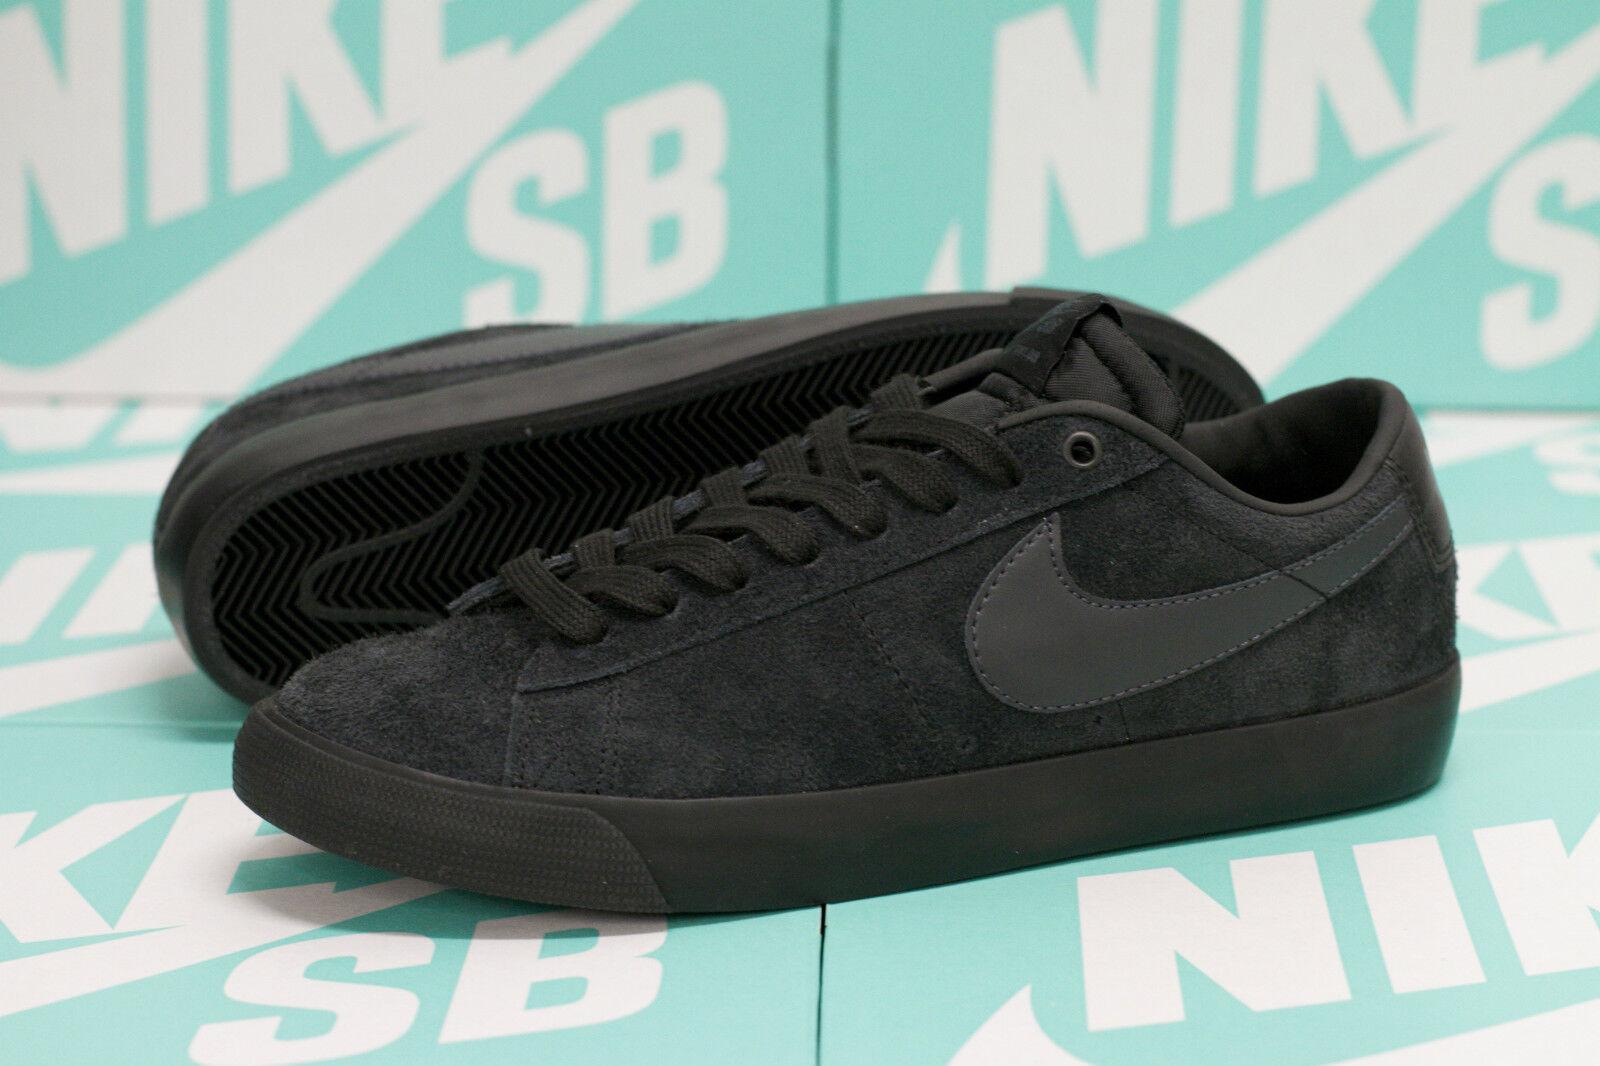 Nike sb grant taylor blazer basso - nero / antracite - 704939 002 sz 10